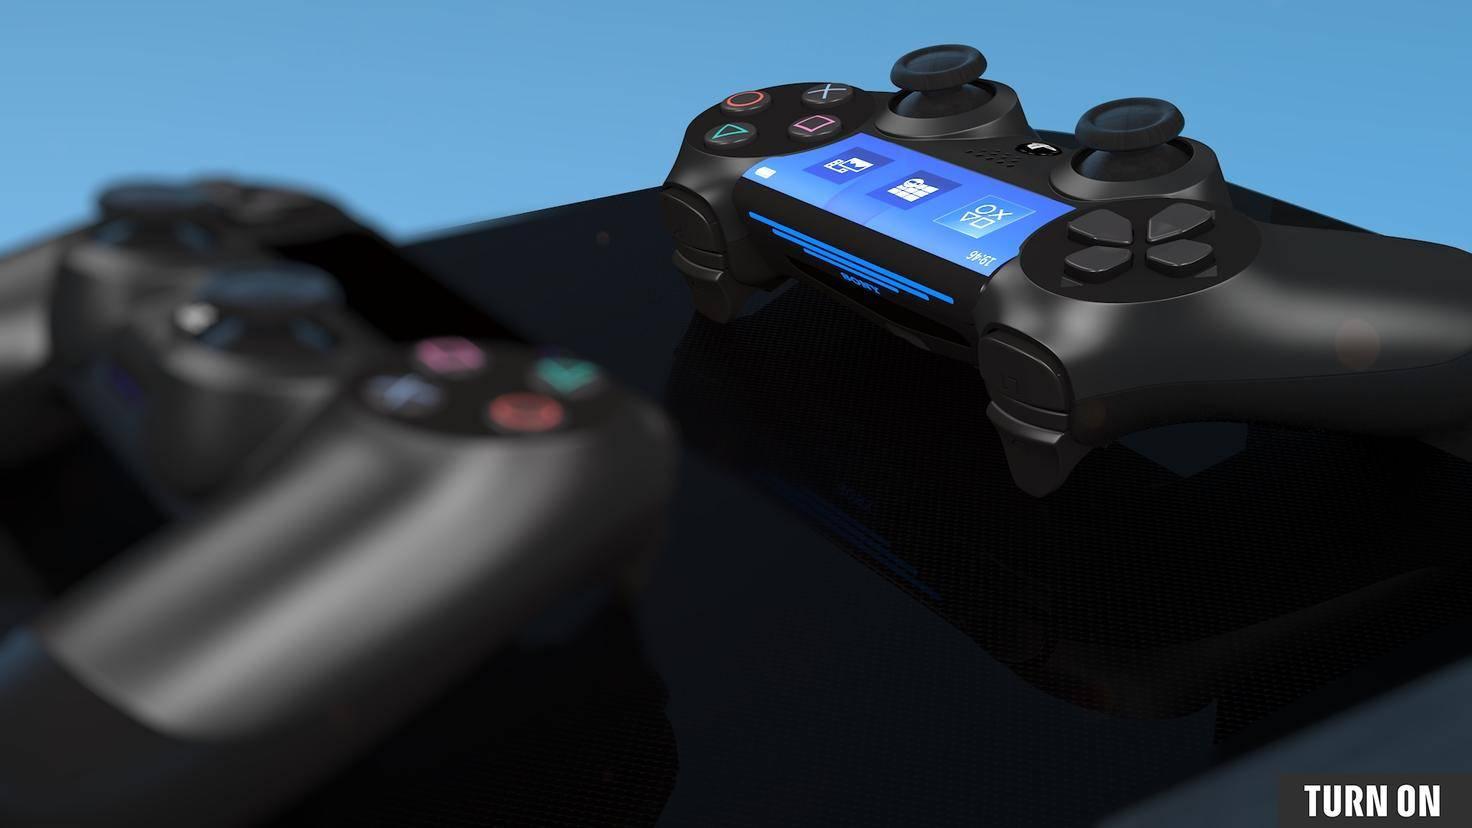 ps5-playstation-5-konzept-turn-on-controller-konsole